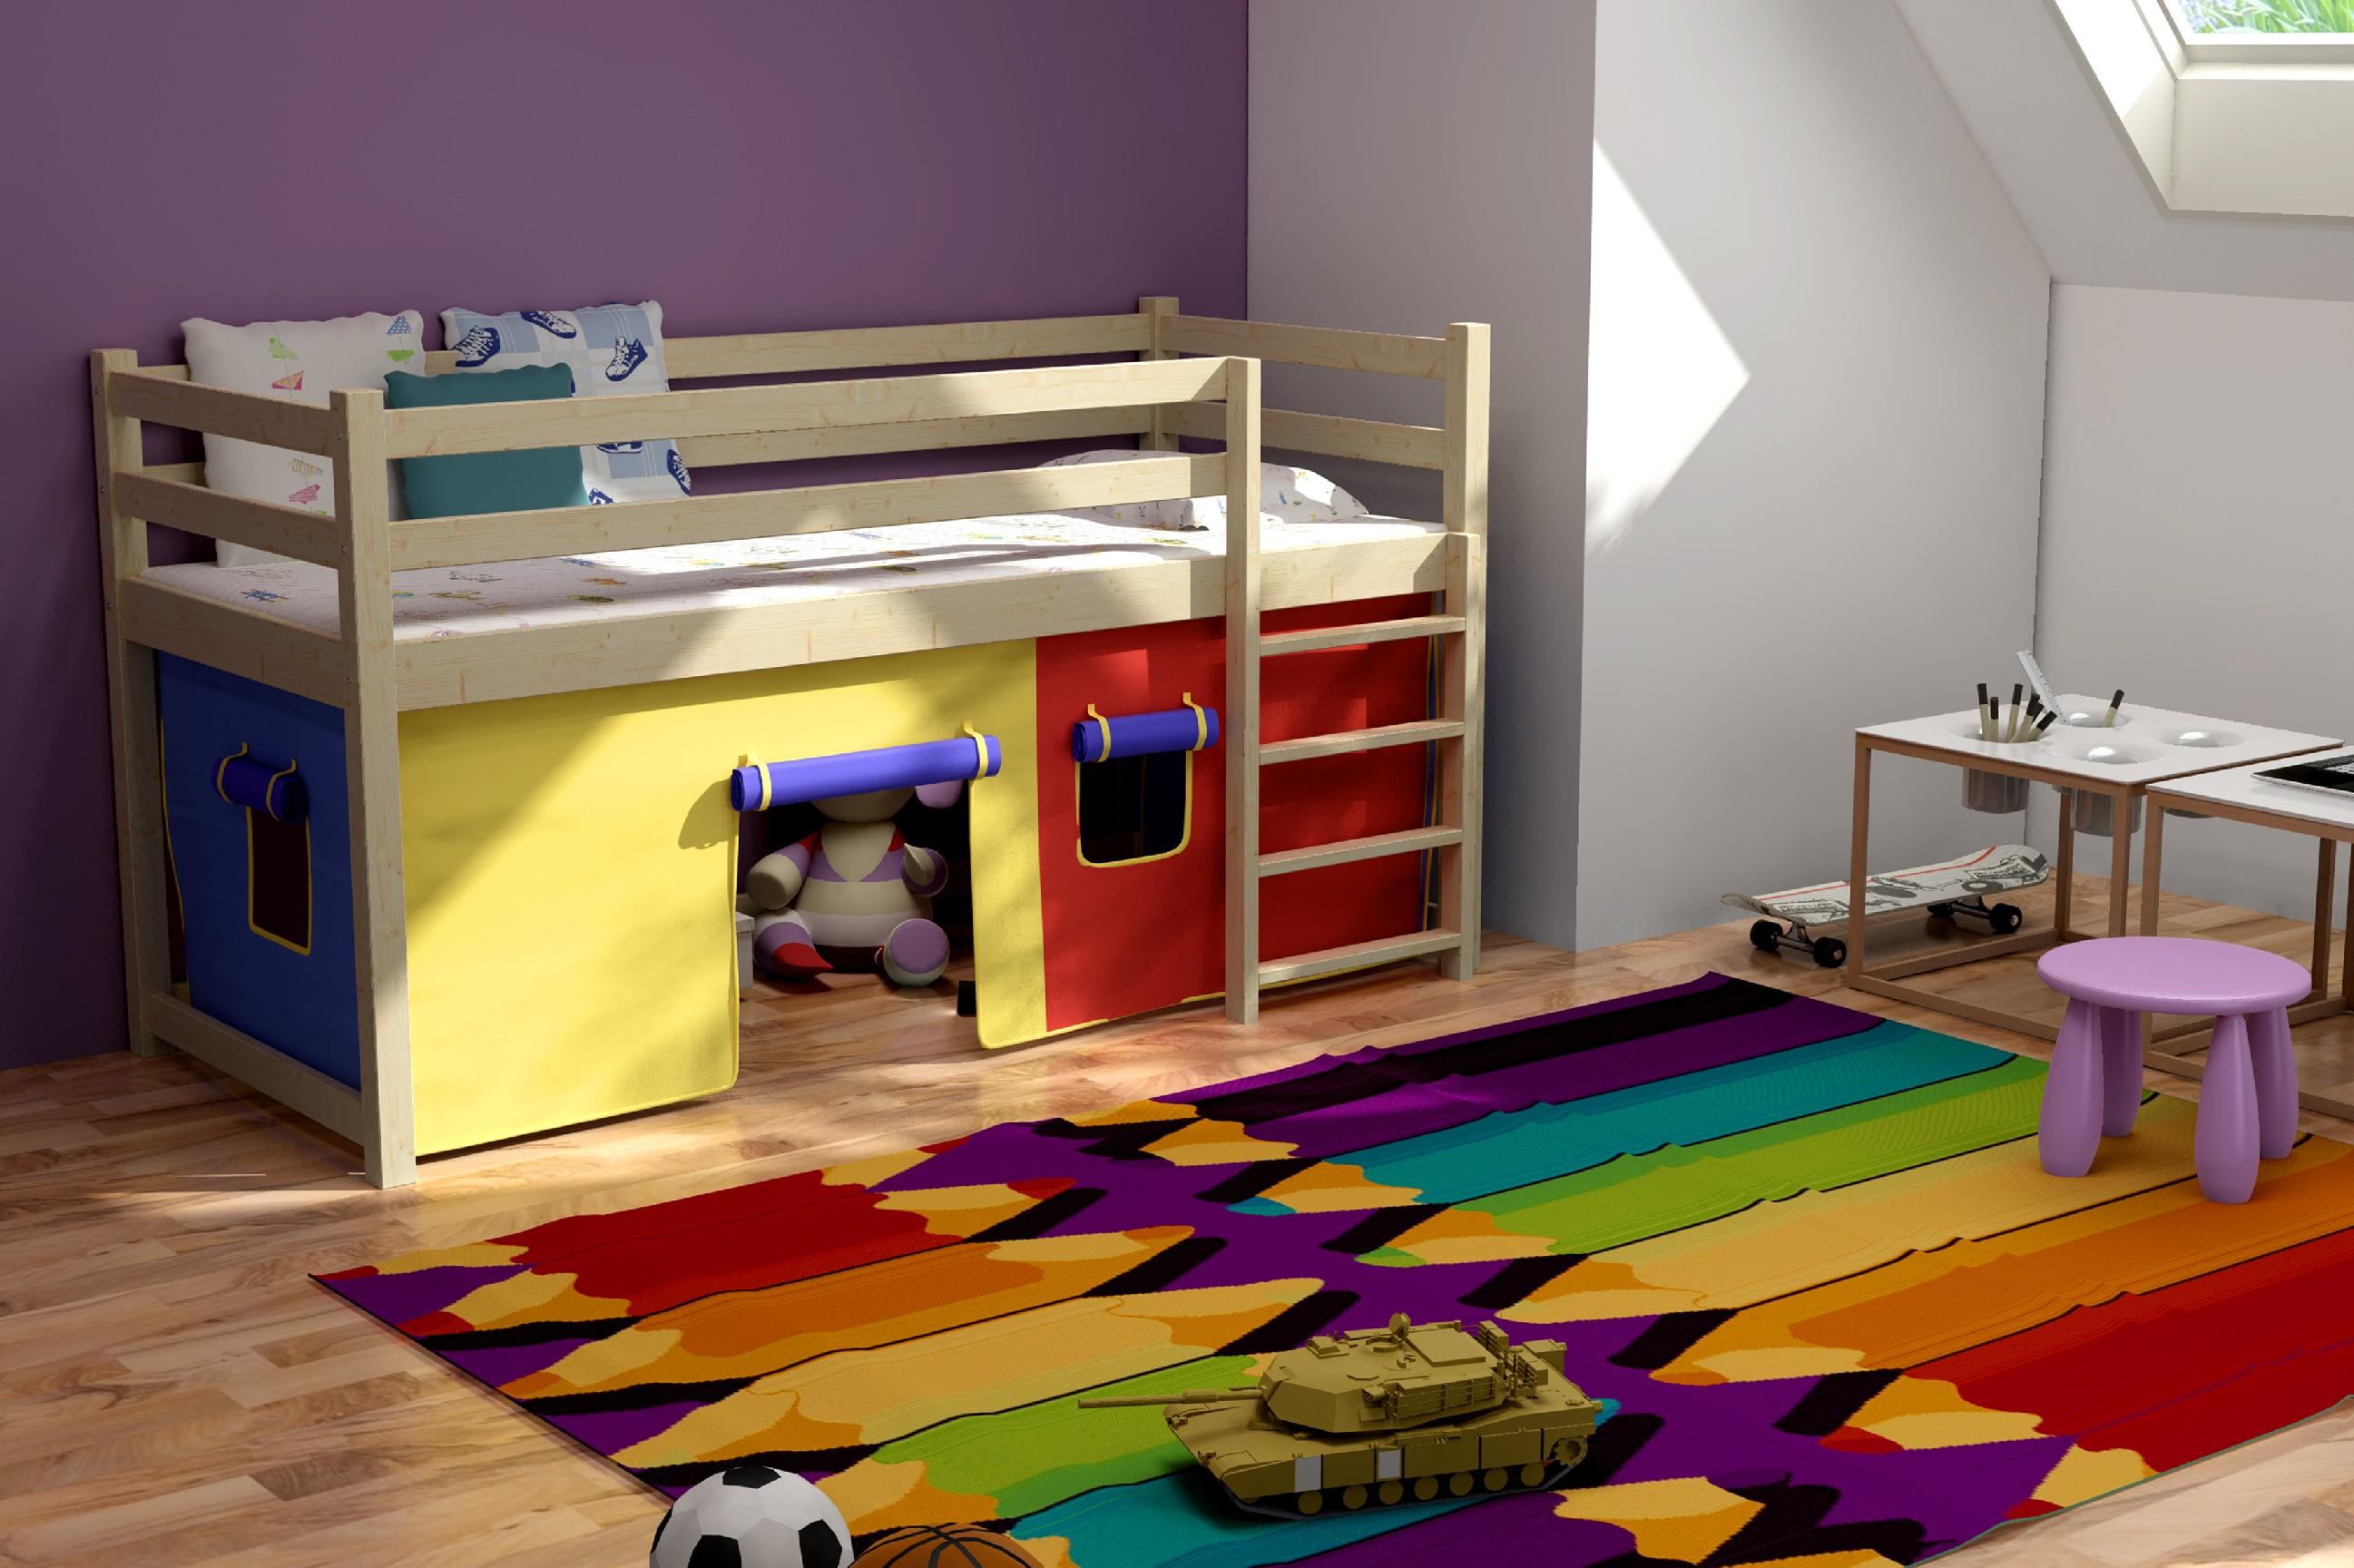 Patrová postel Marina + laťový rošt ZDARMA Rozměr: 200 cm x 90 cm, Povrchová úprava: bezbarvý lak